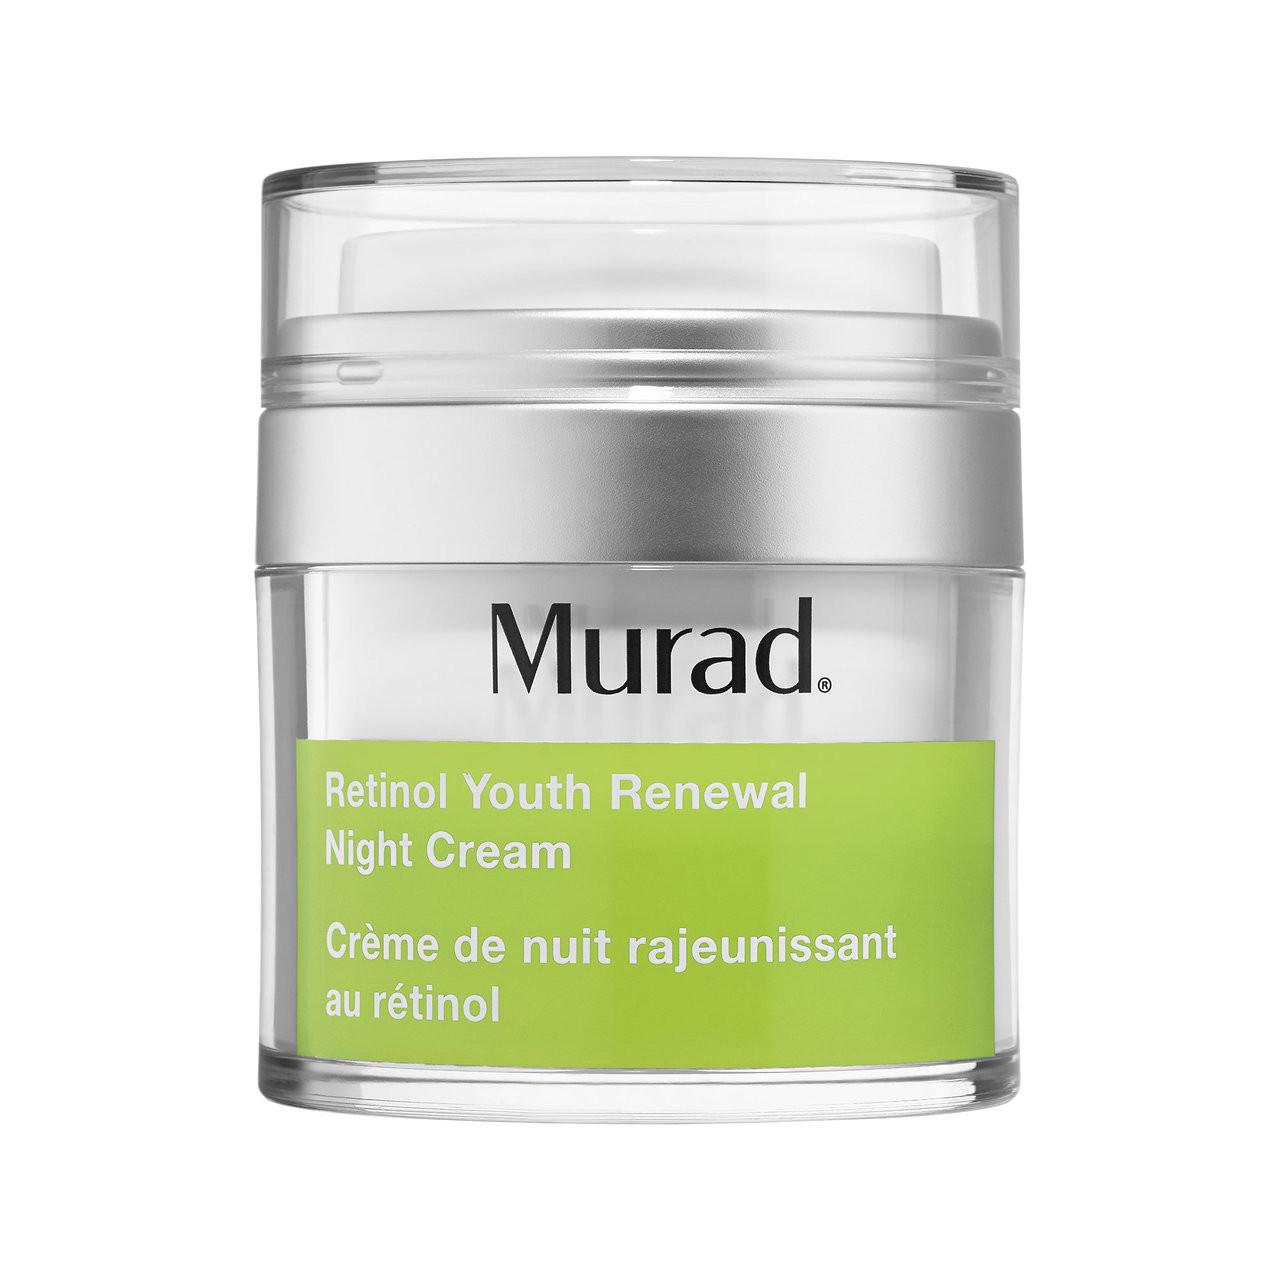 Murad Retinol Youth Renewal Night Cream 1.7 fl oz